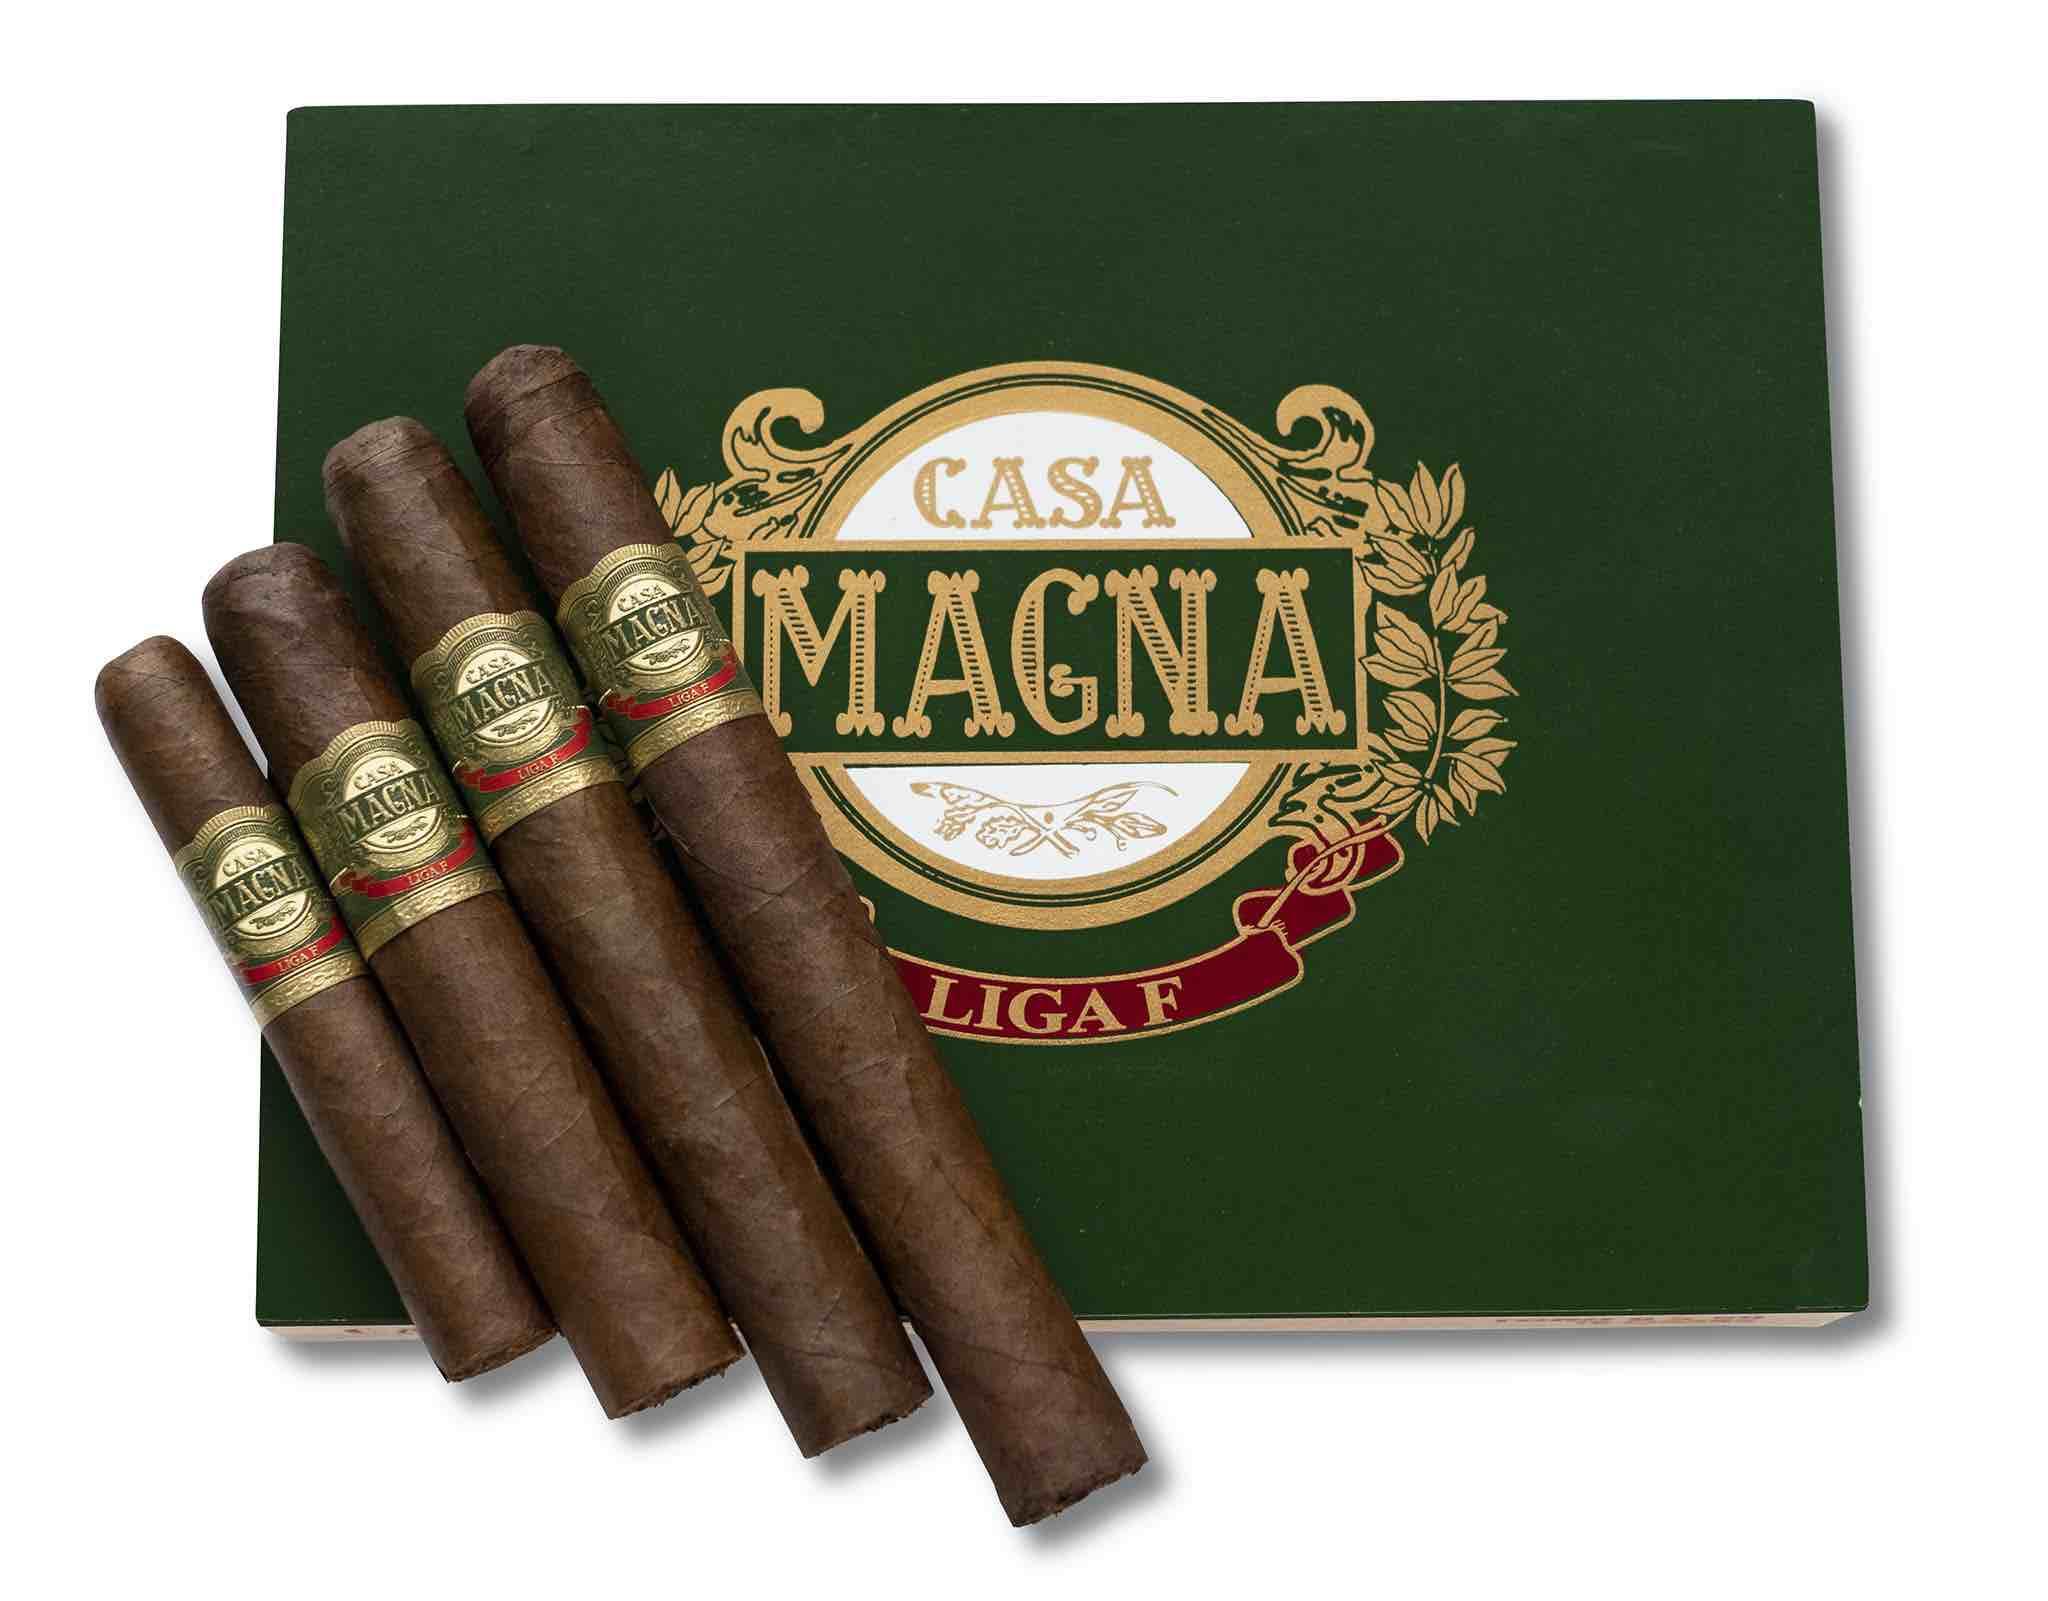 Cigar News: Quesada Cigars Announces Casa Magna Liga F